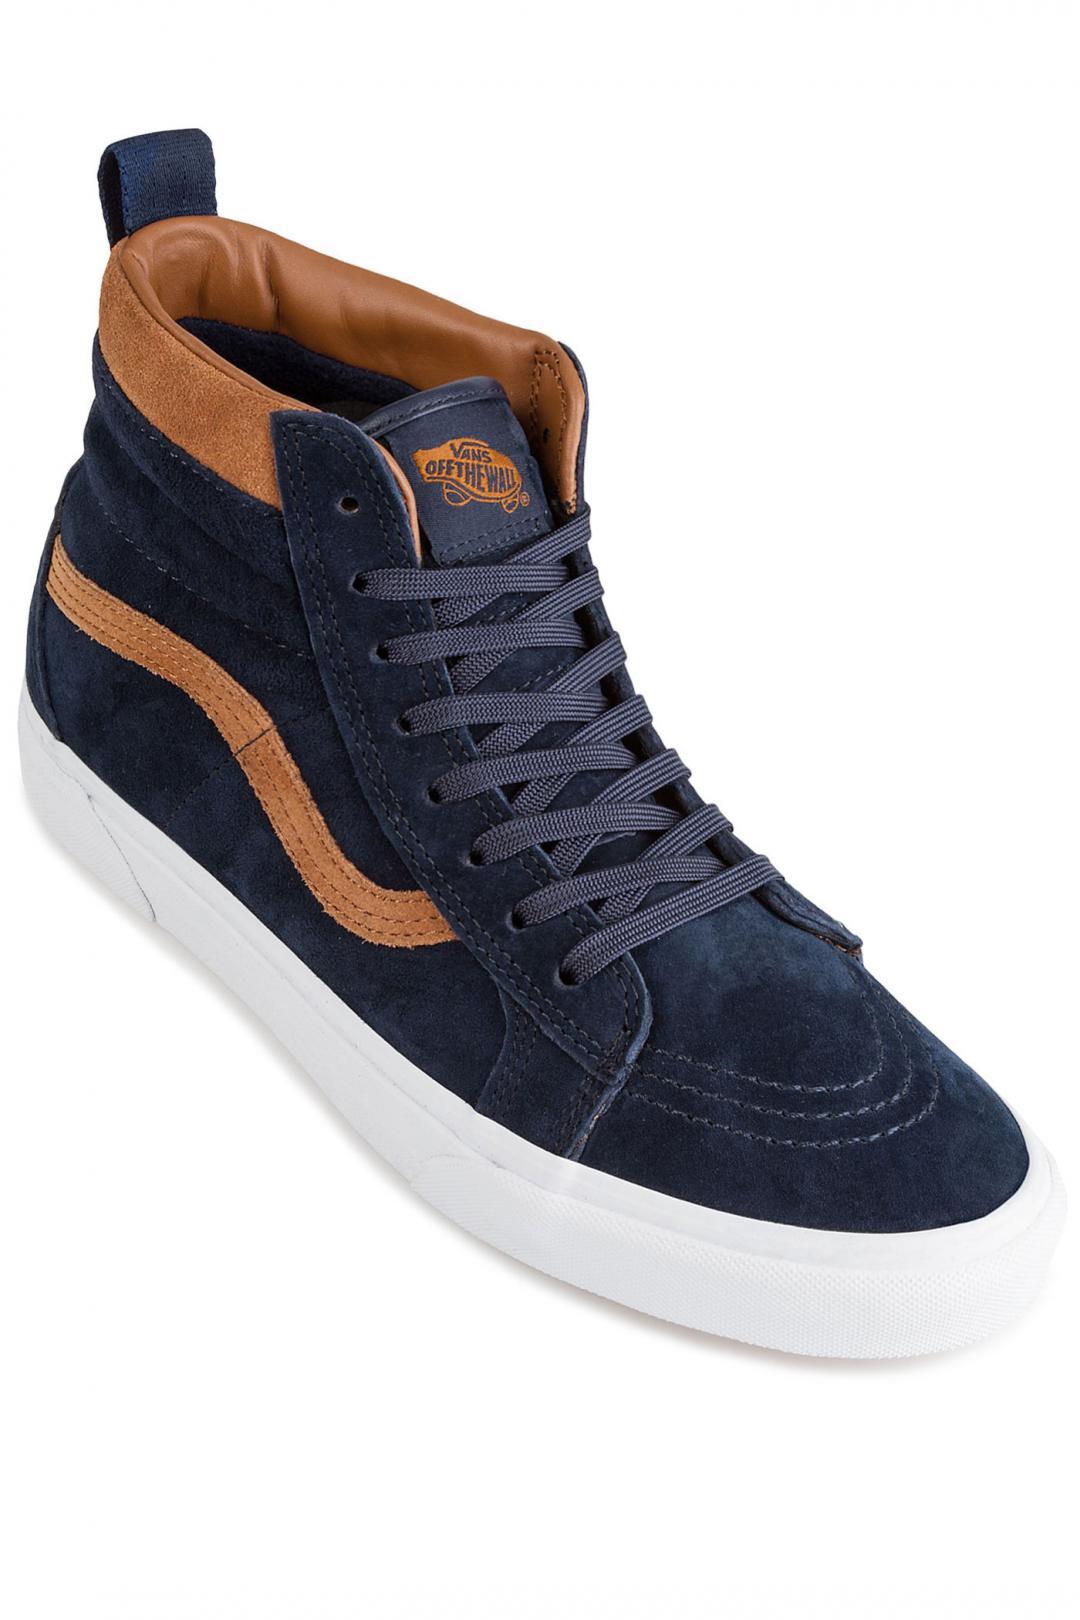 Uomo Vans Sk8-Hi MTE Suede dress blues   Sneaker